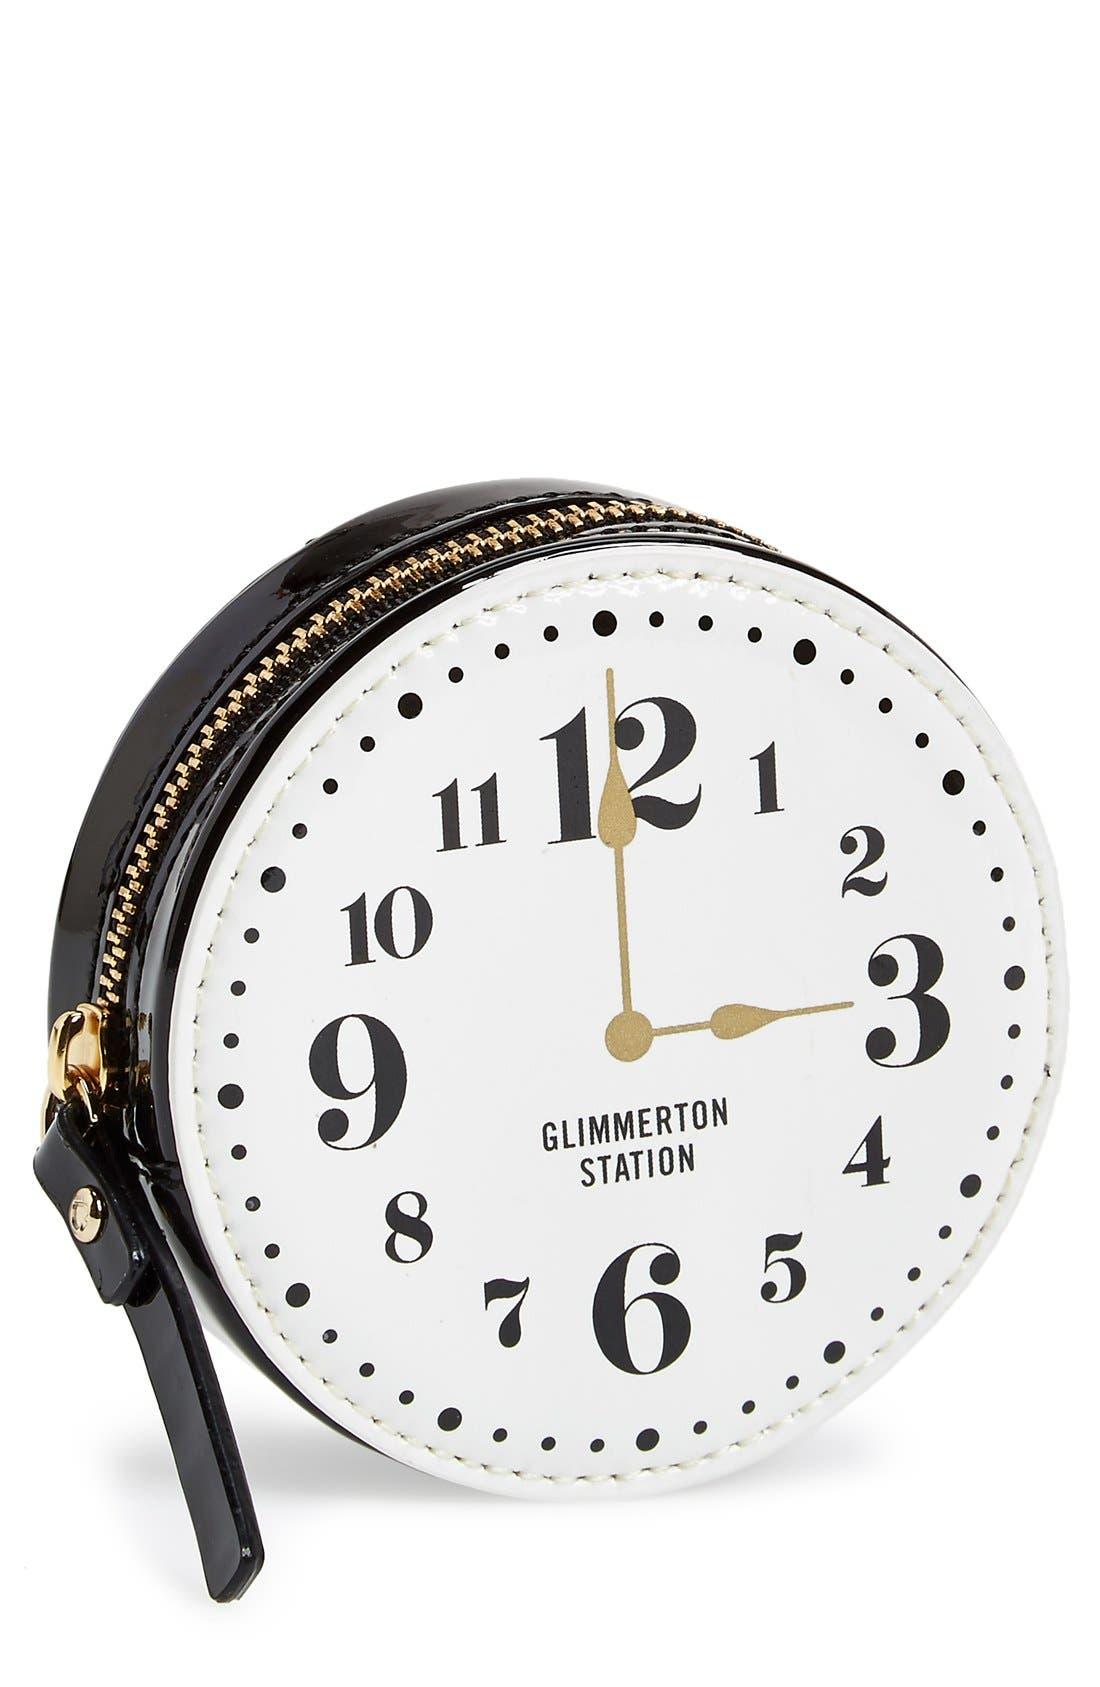 'all aboard - clock' coin purse,                             Main thumbnail 1, color,                             001